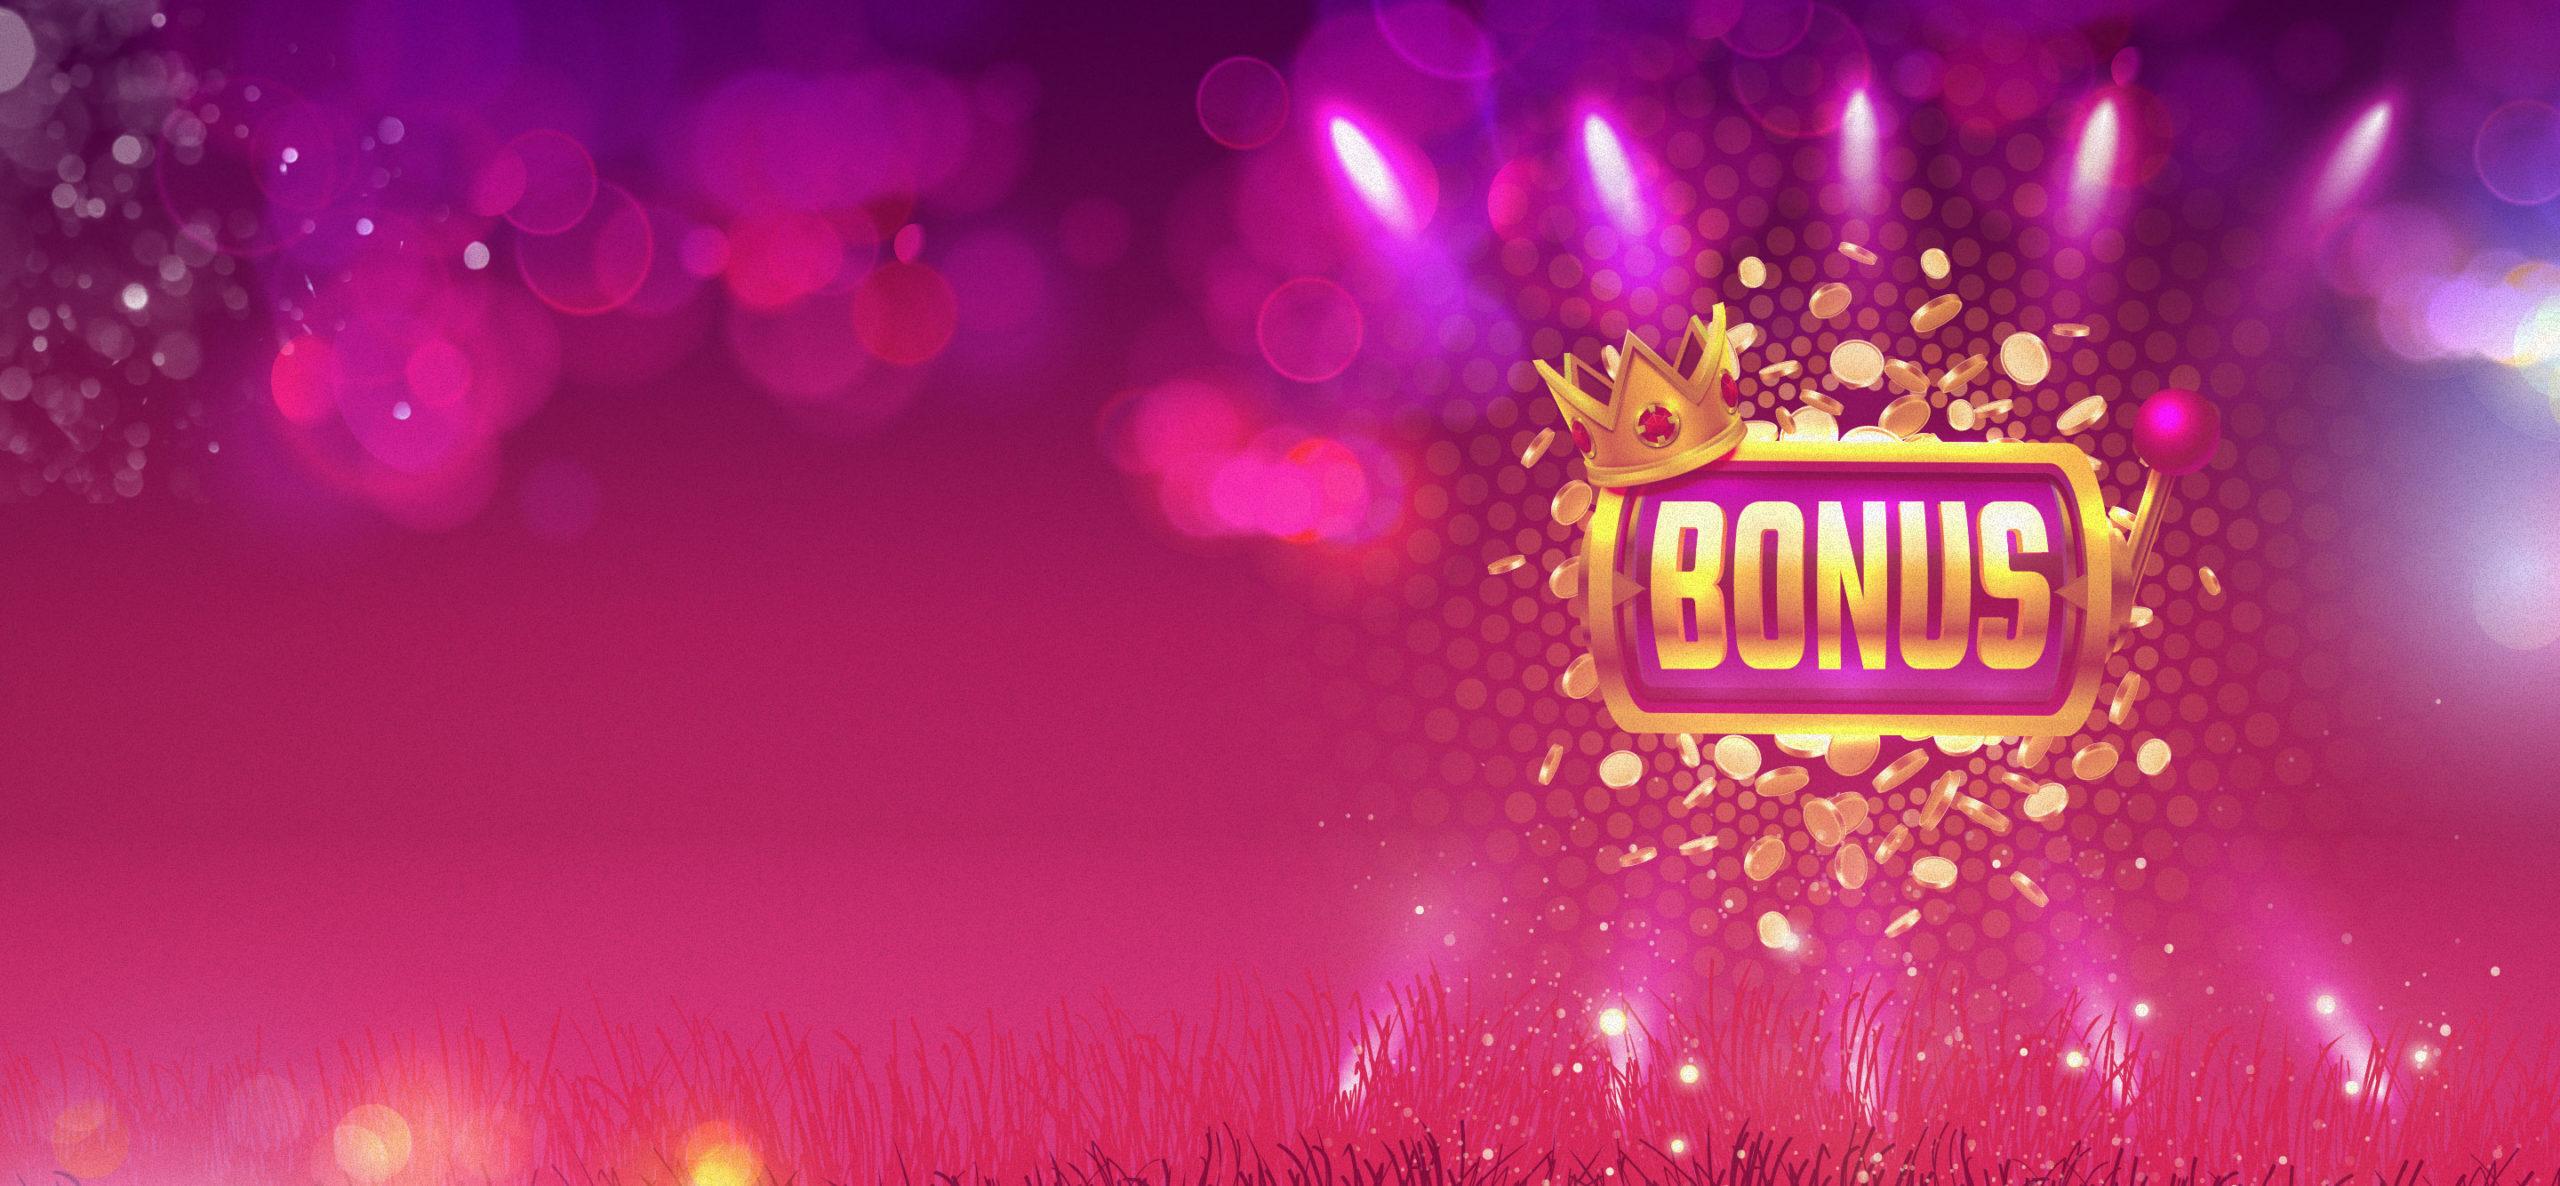 get big bonuses at slots lv casino